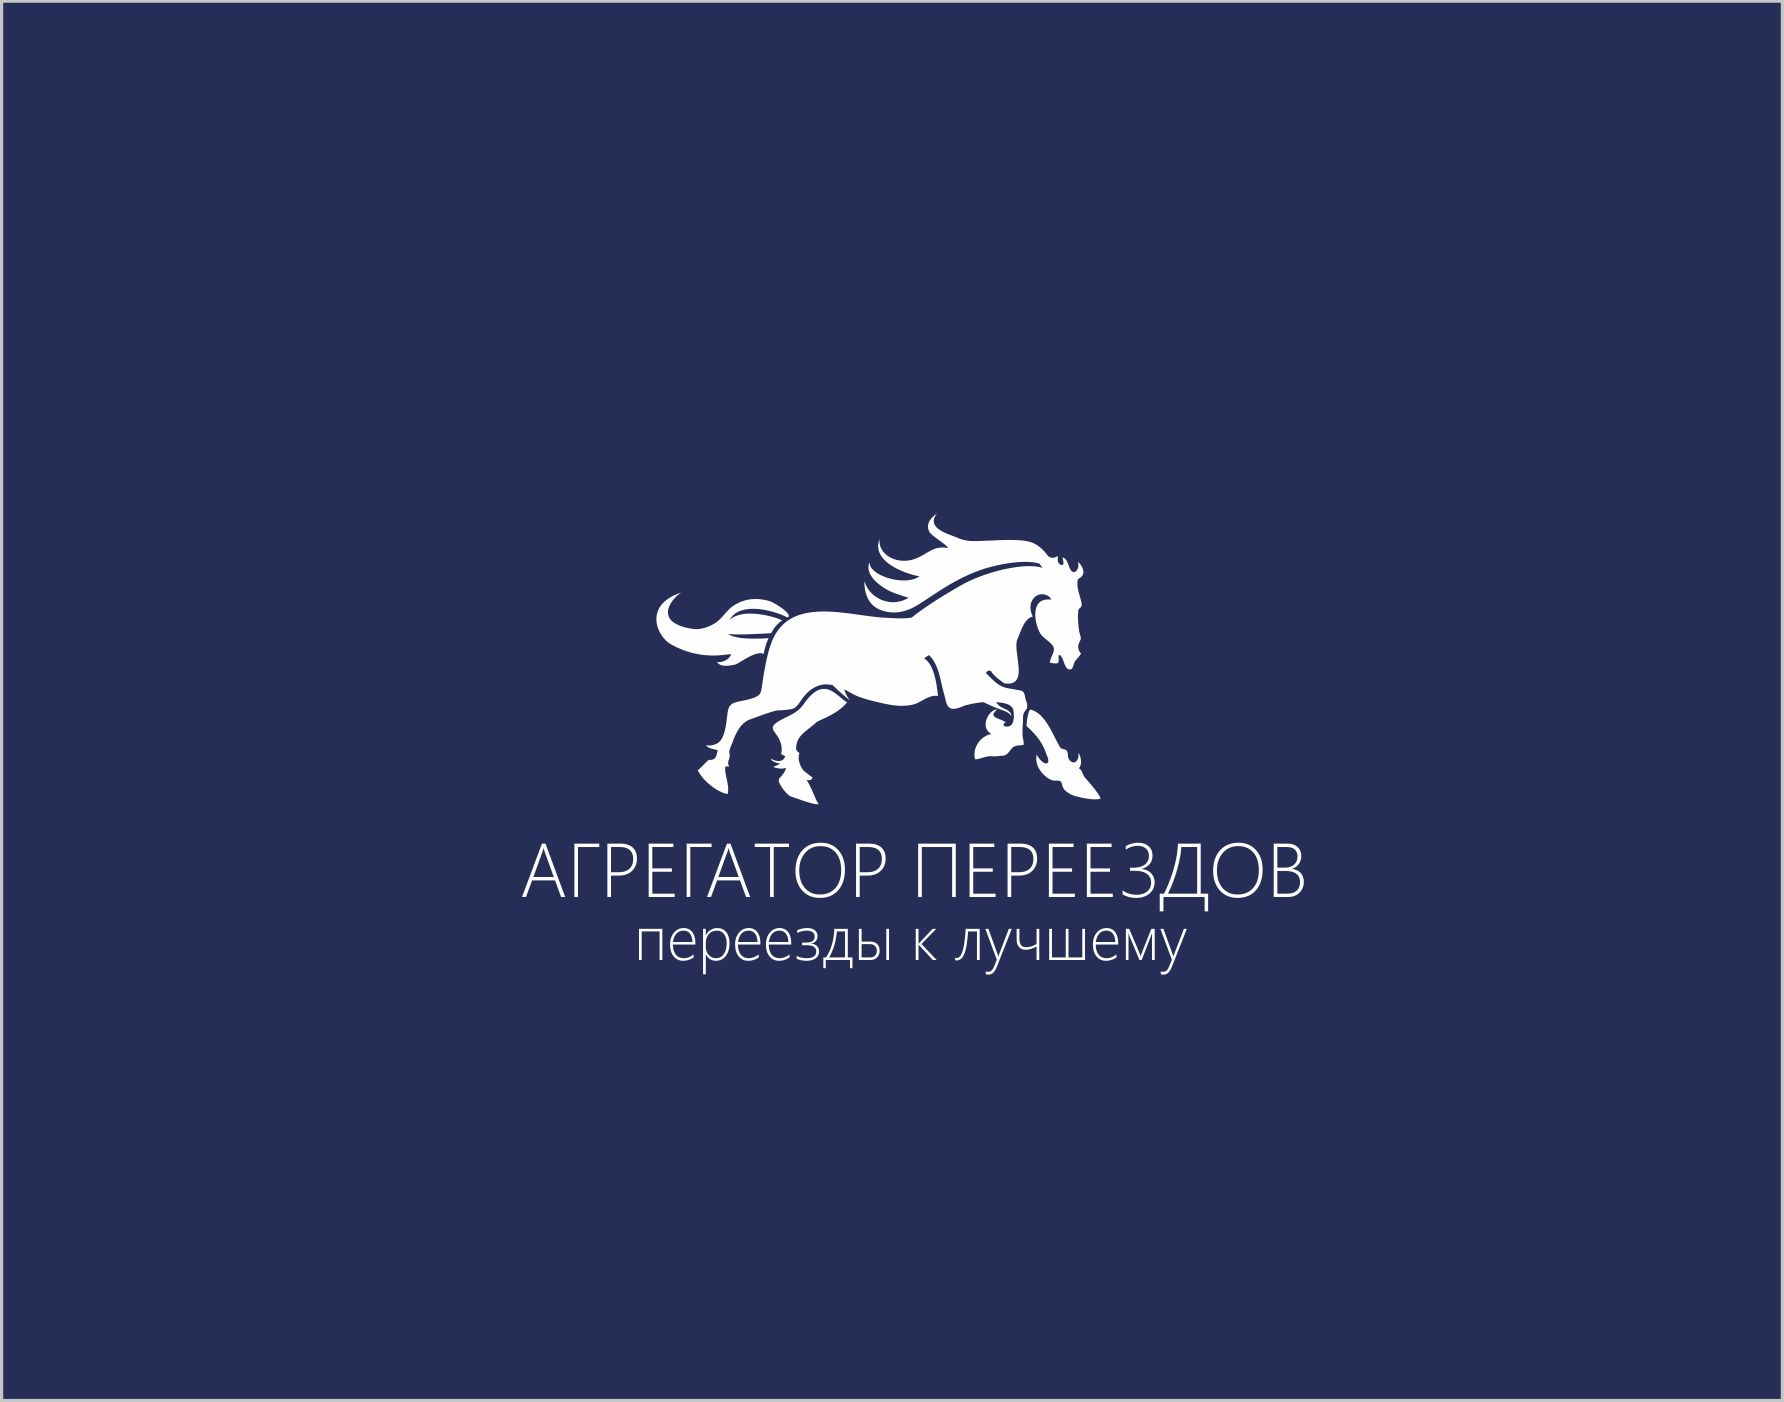 Логотип для компании Агрегатор переездов - дизайнер W91I